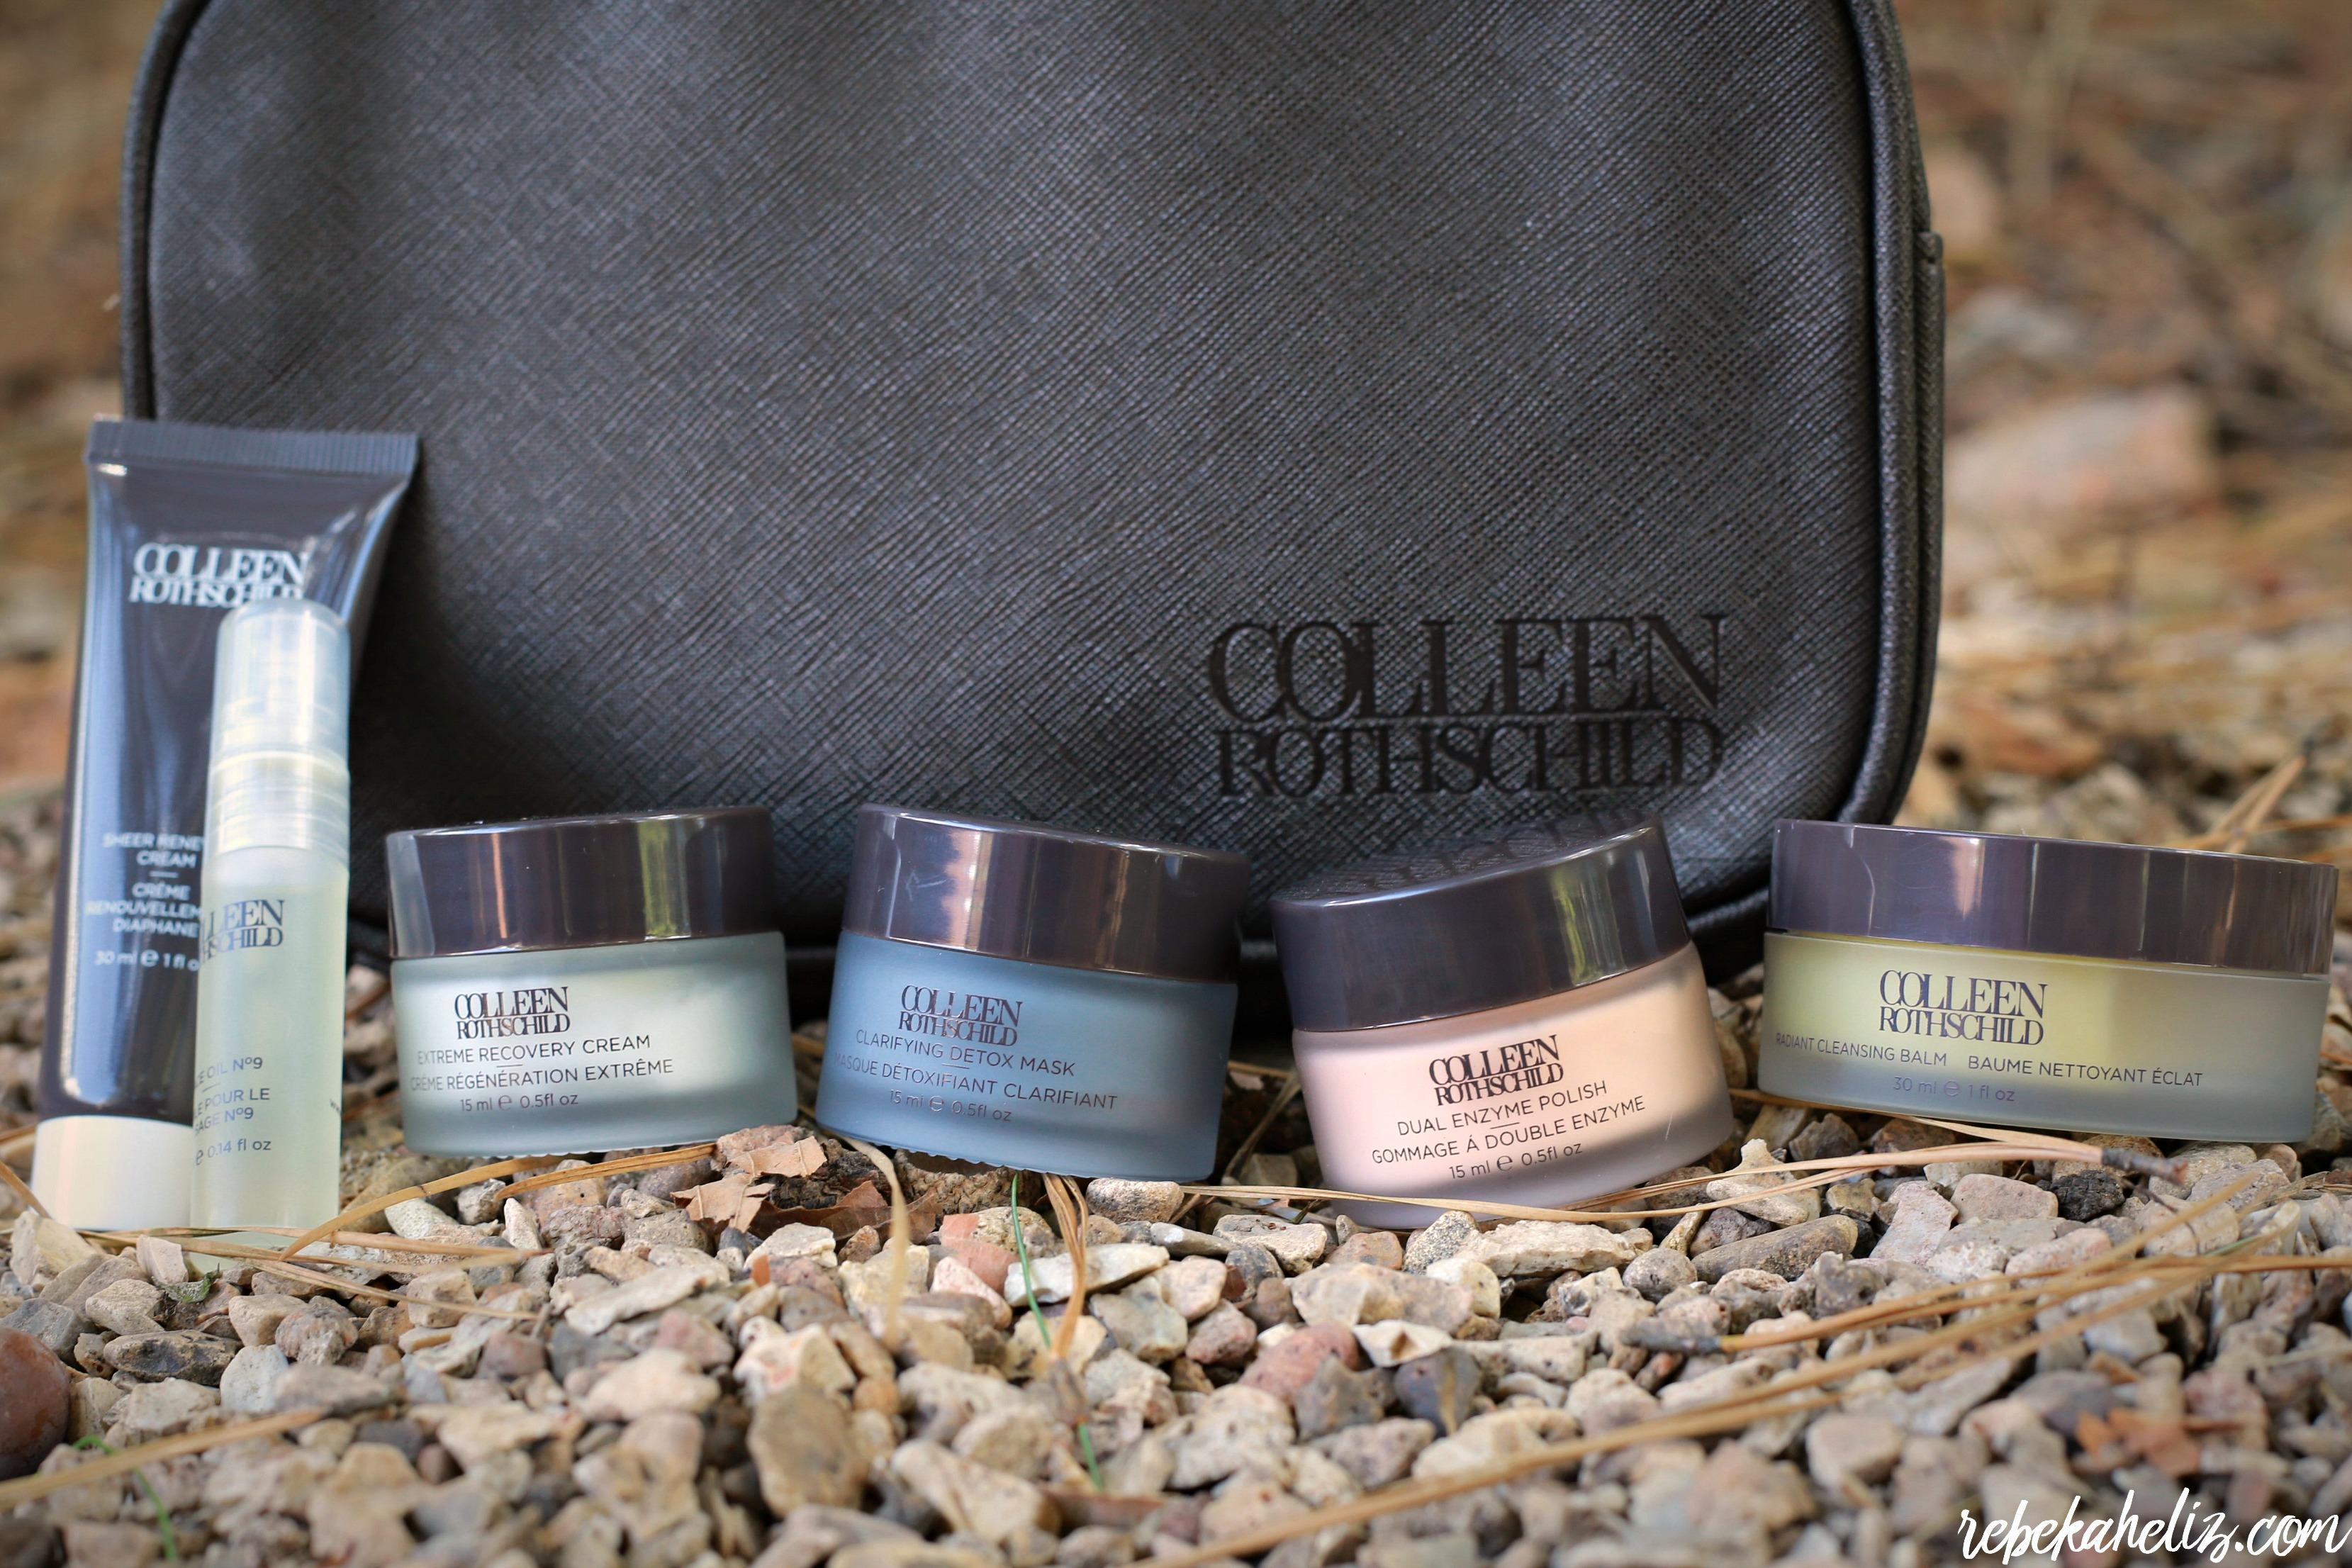 colleen rothschild, skincare, skin, beauty